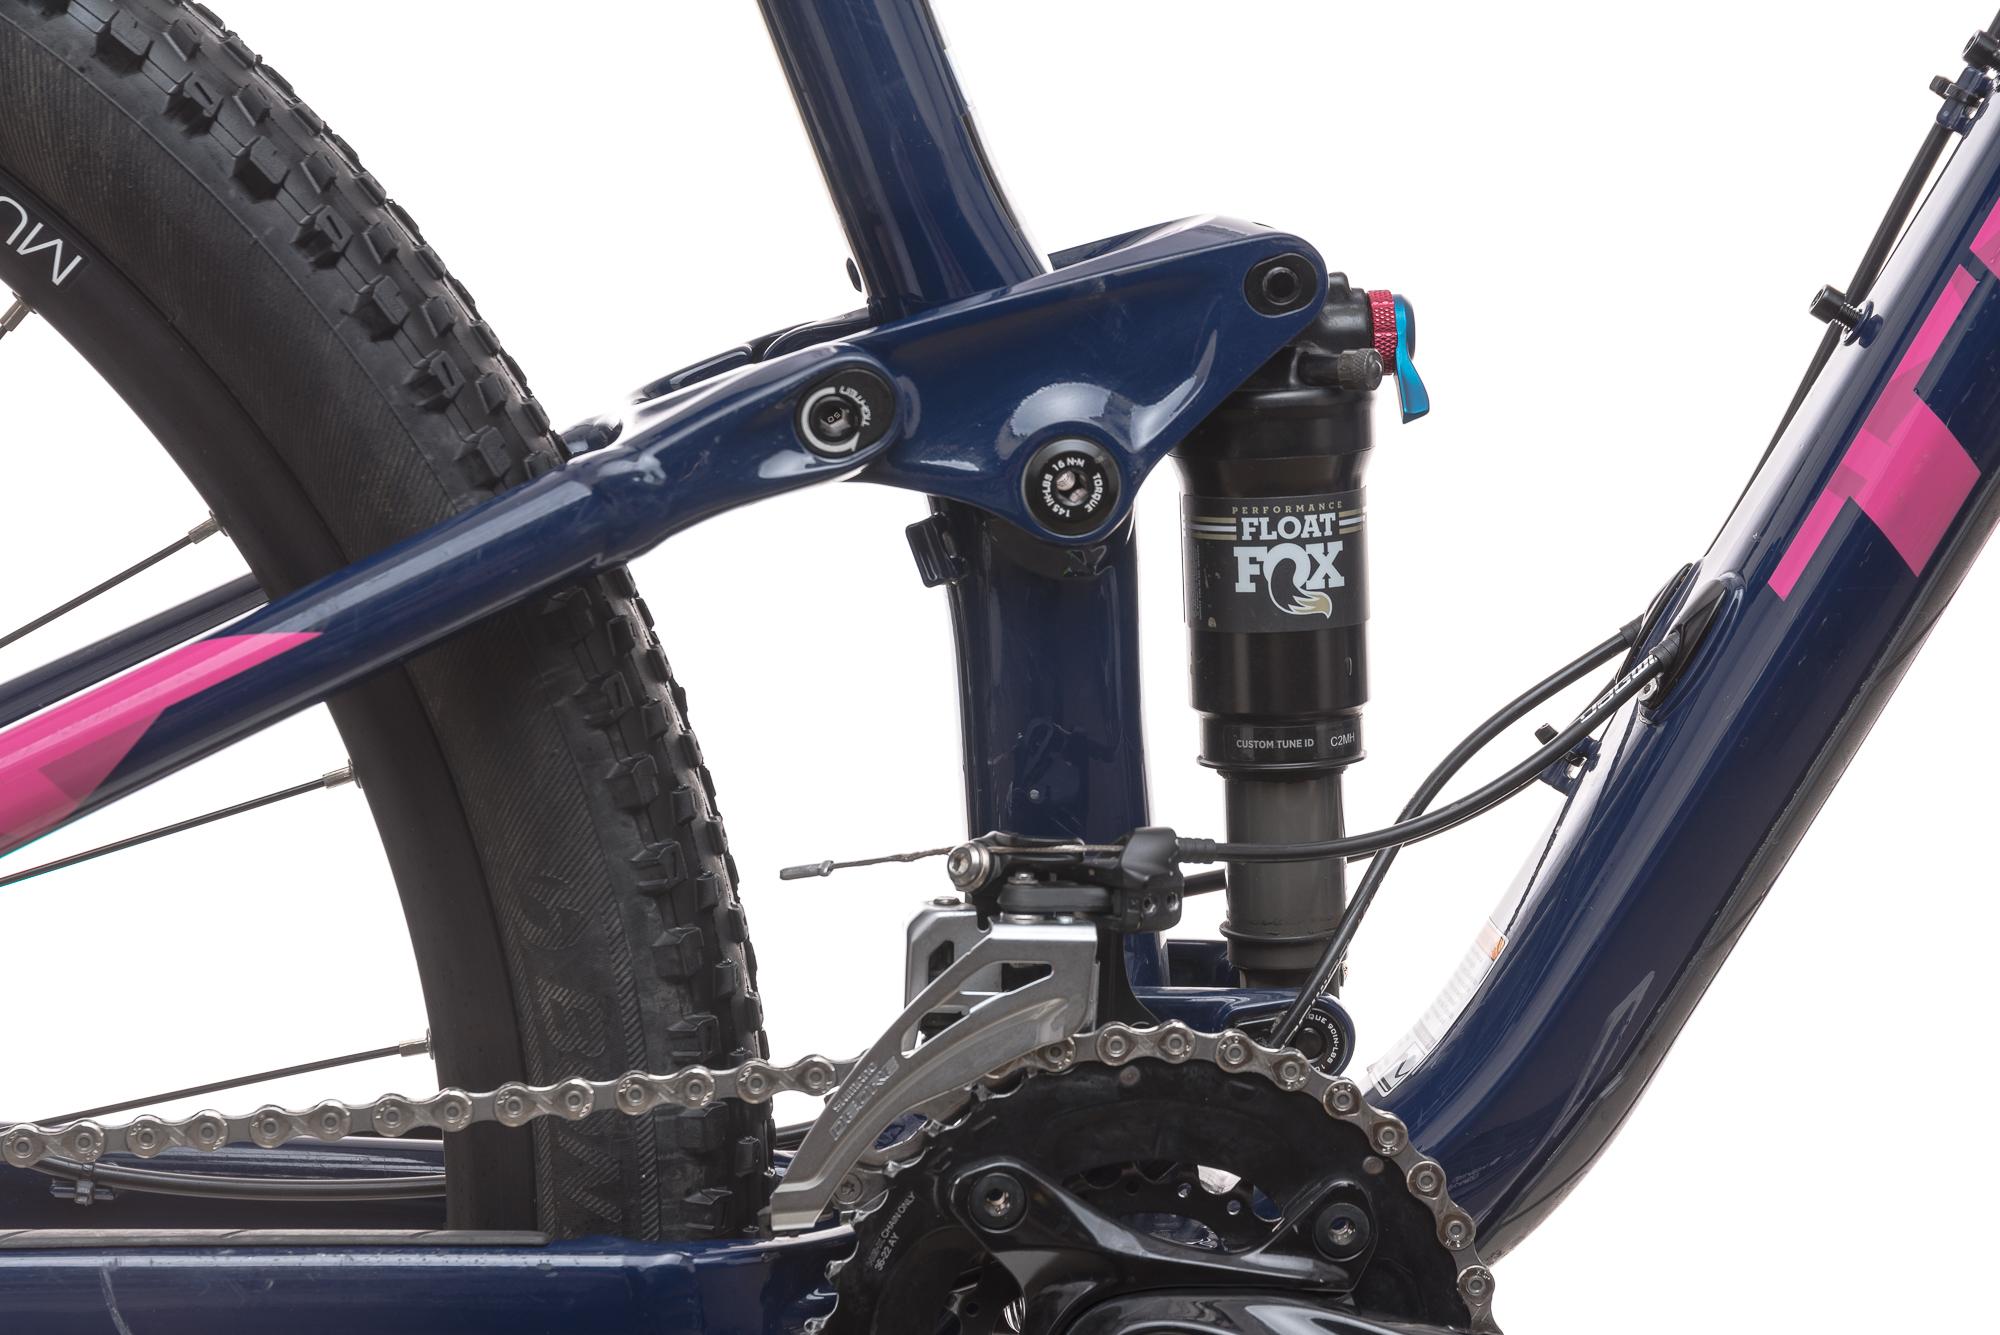 e18c87d6006 2016 Trek Top Fuel 8 Wsd Womens Mountain Bike 15 5in Small 27 5